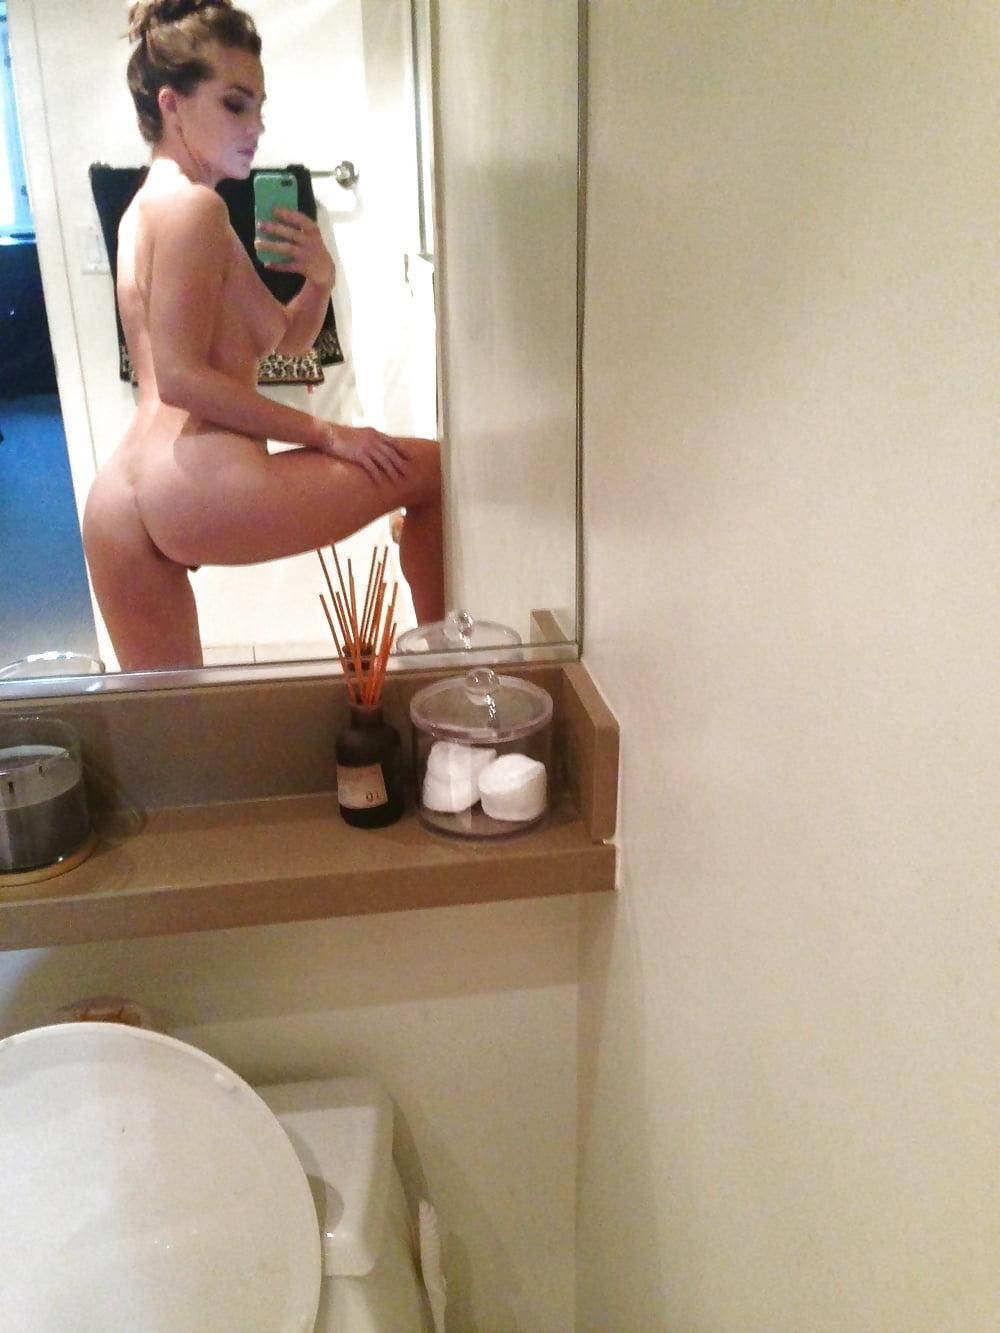 Jillian Murray nude pics leak march 2017